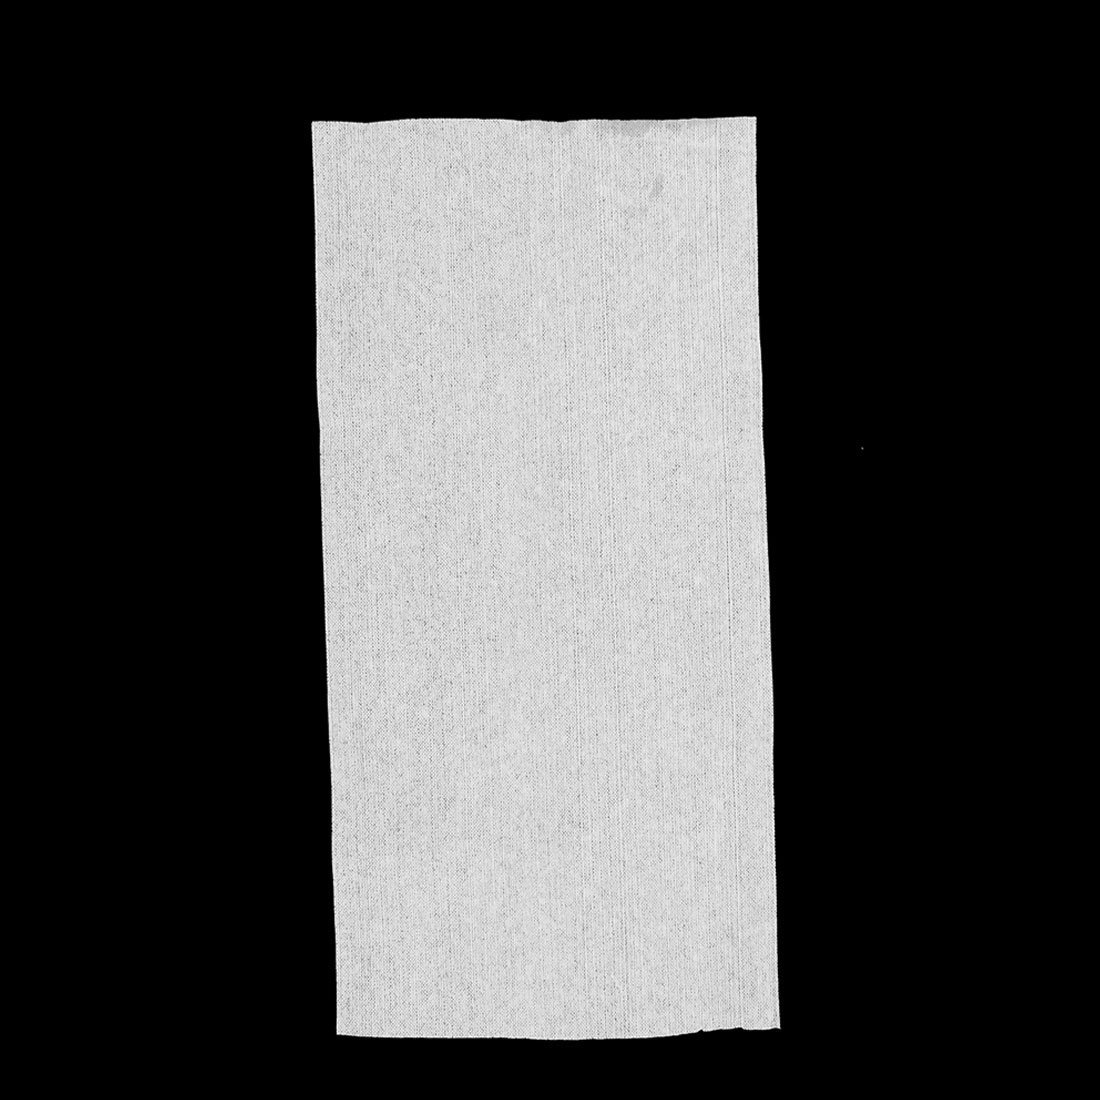 Amazon.com: eDealMax No Tejido de la Tela Viajar viaje de Lavado desechables toalla de limpieza DE 57 x 27cm 20pcs Blanca: Home & Kitchen